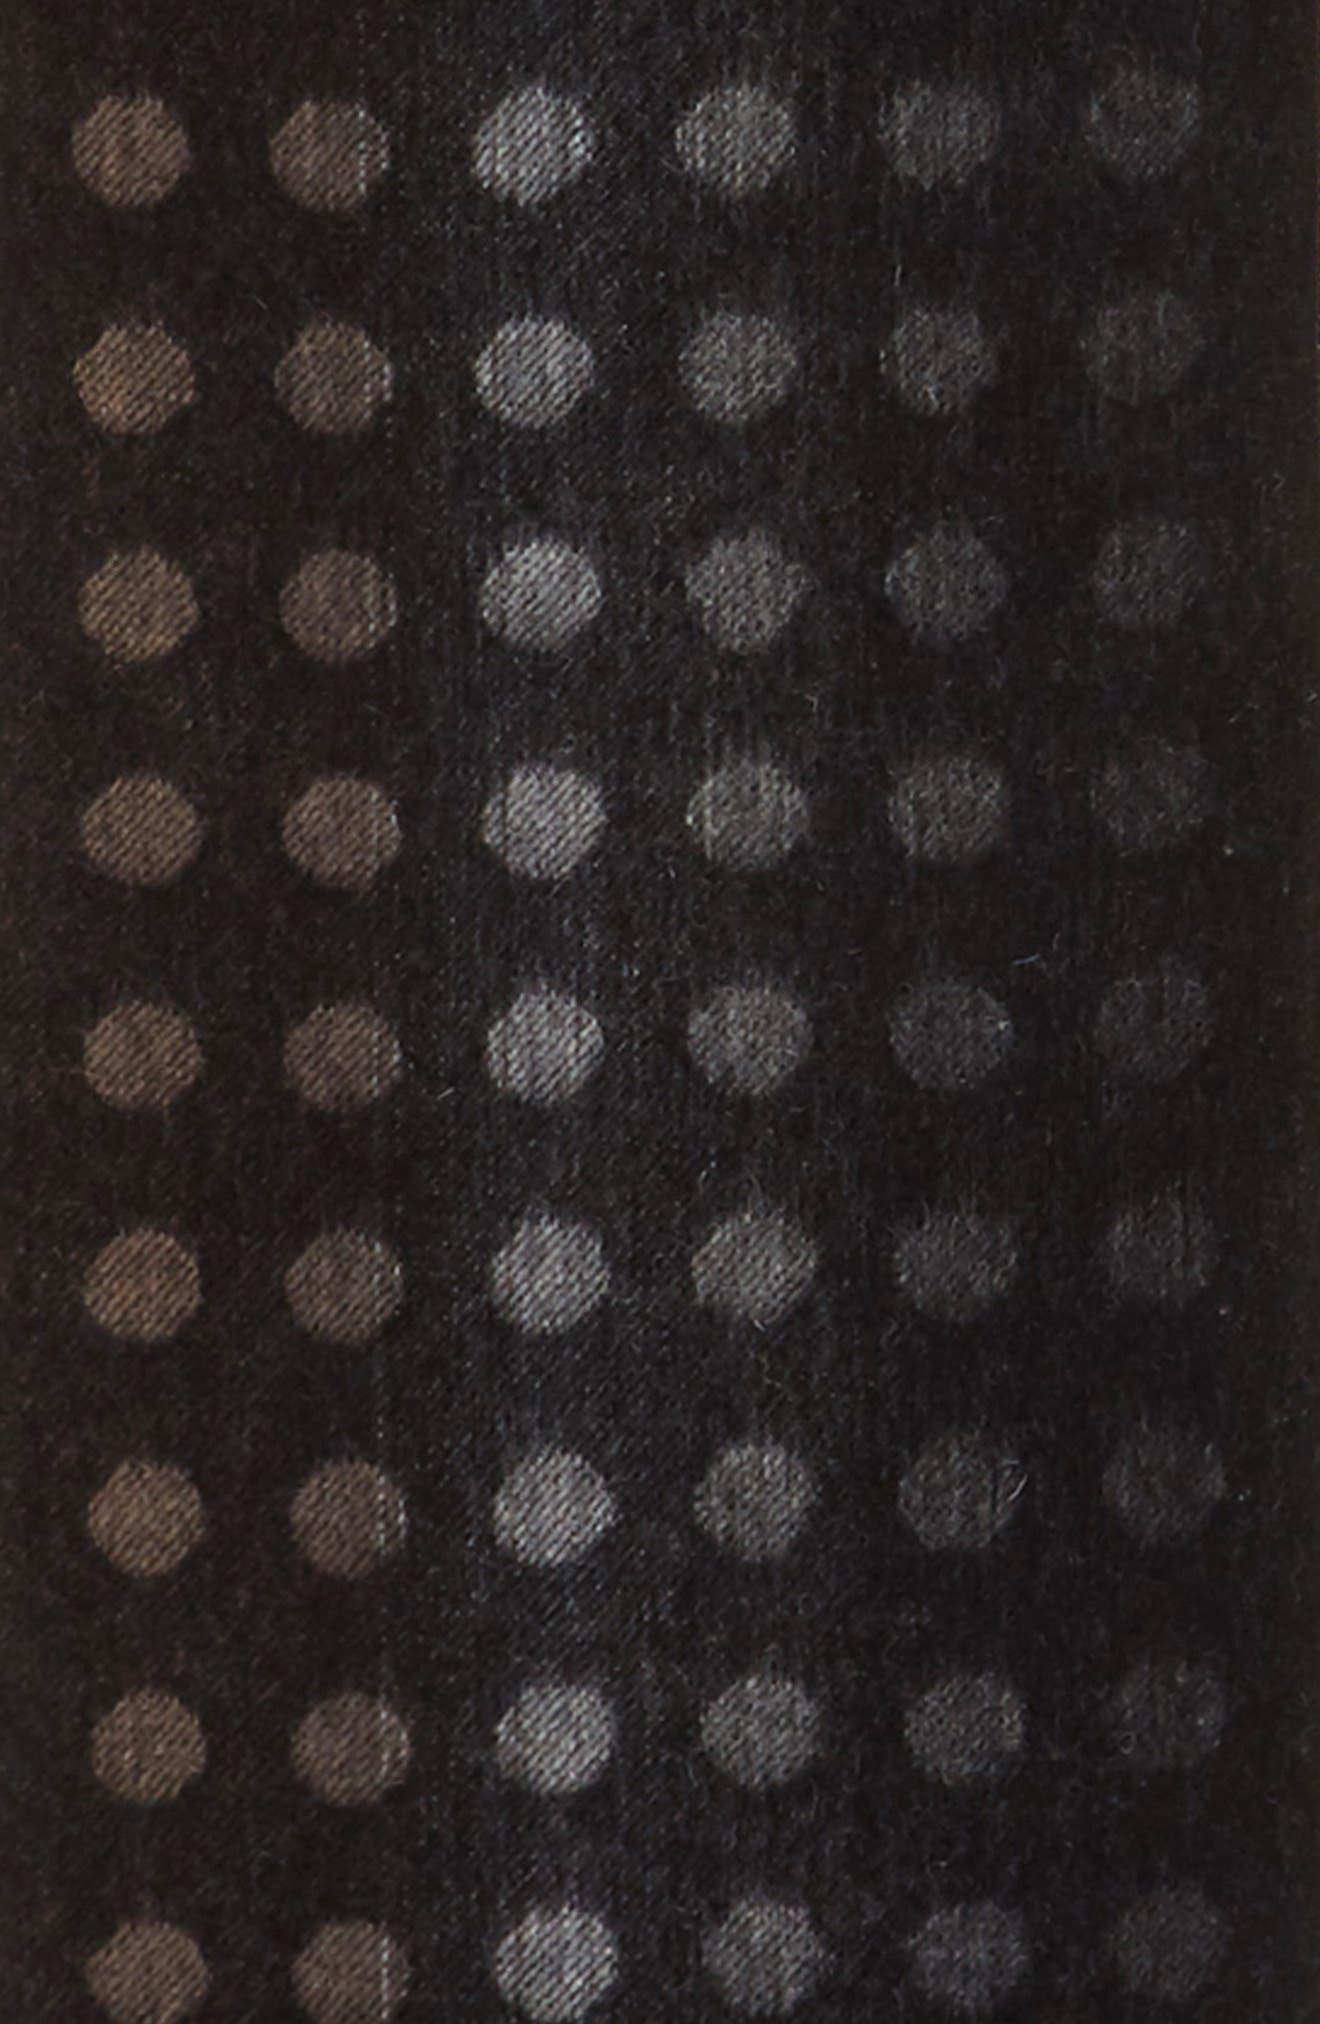 Cashmere Scarf,                             Alternate thumbnail 3, color,                             250